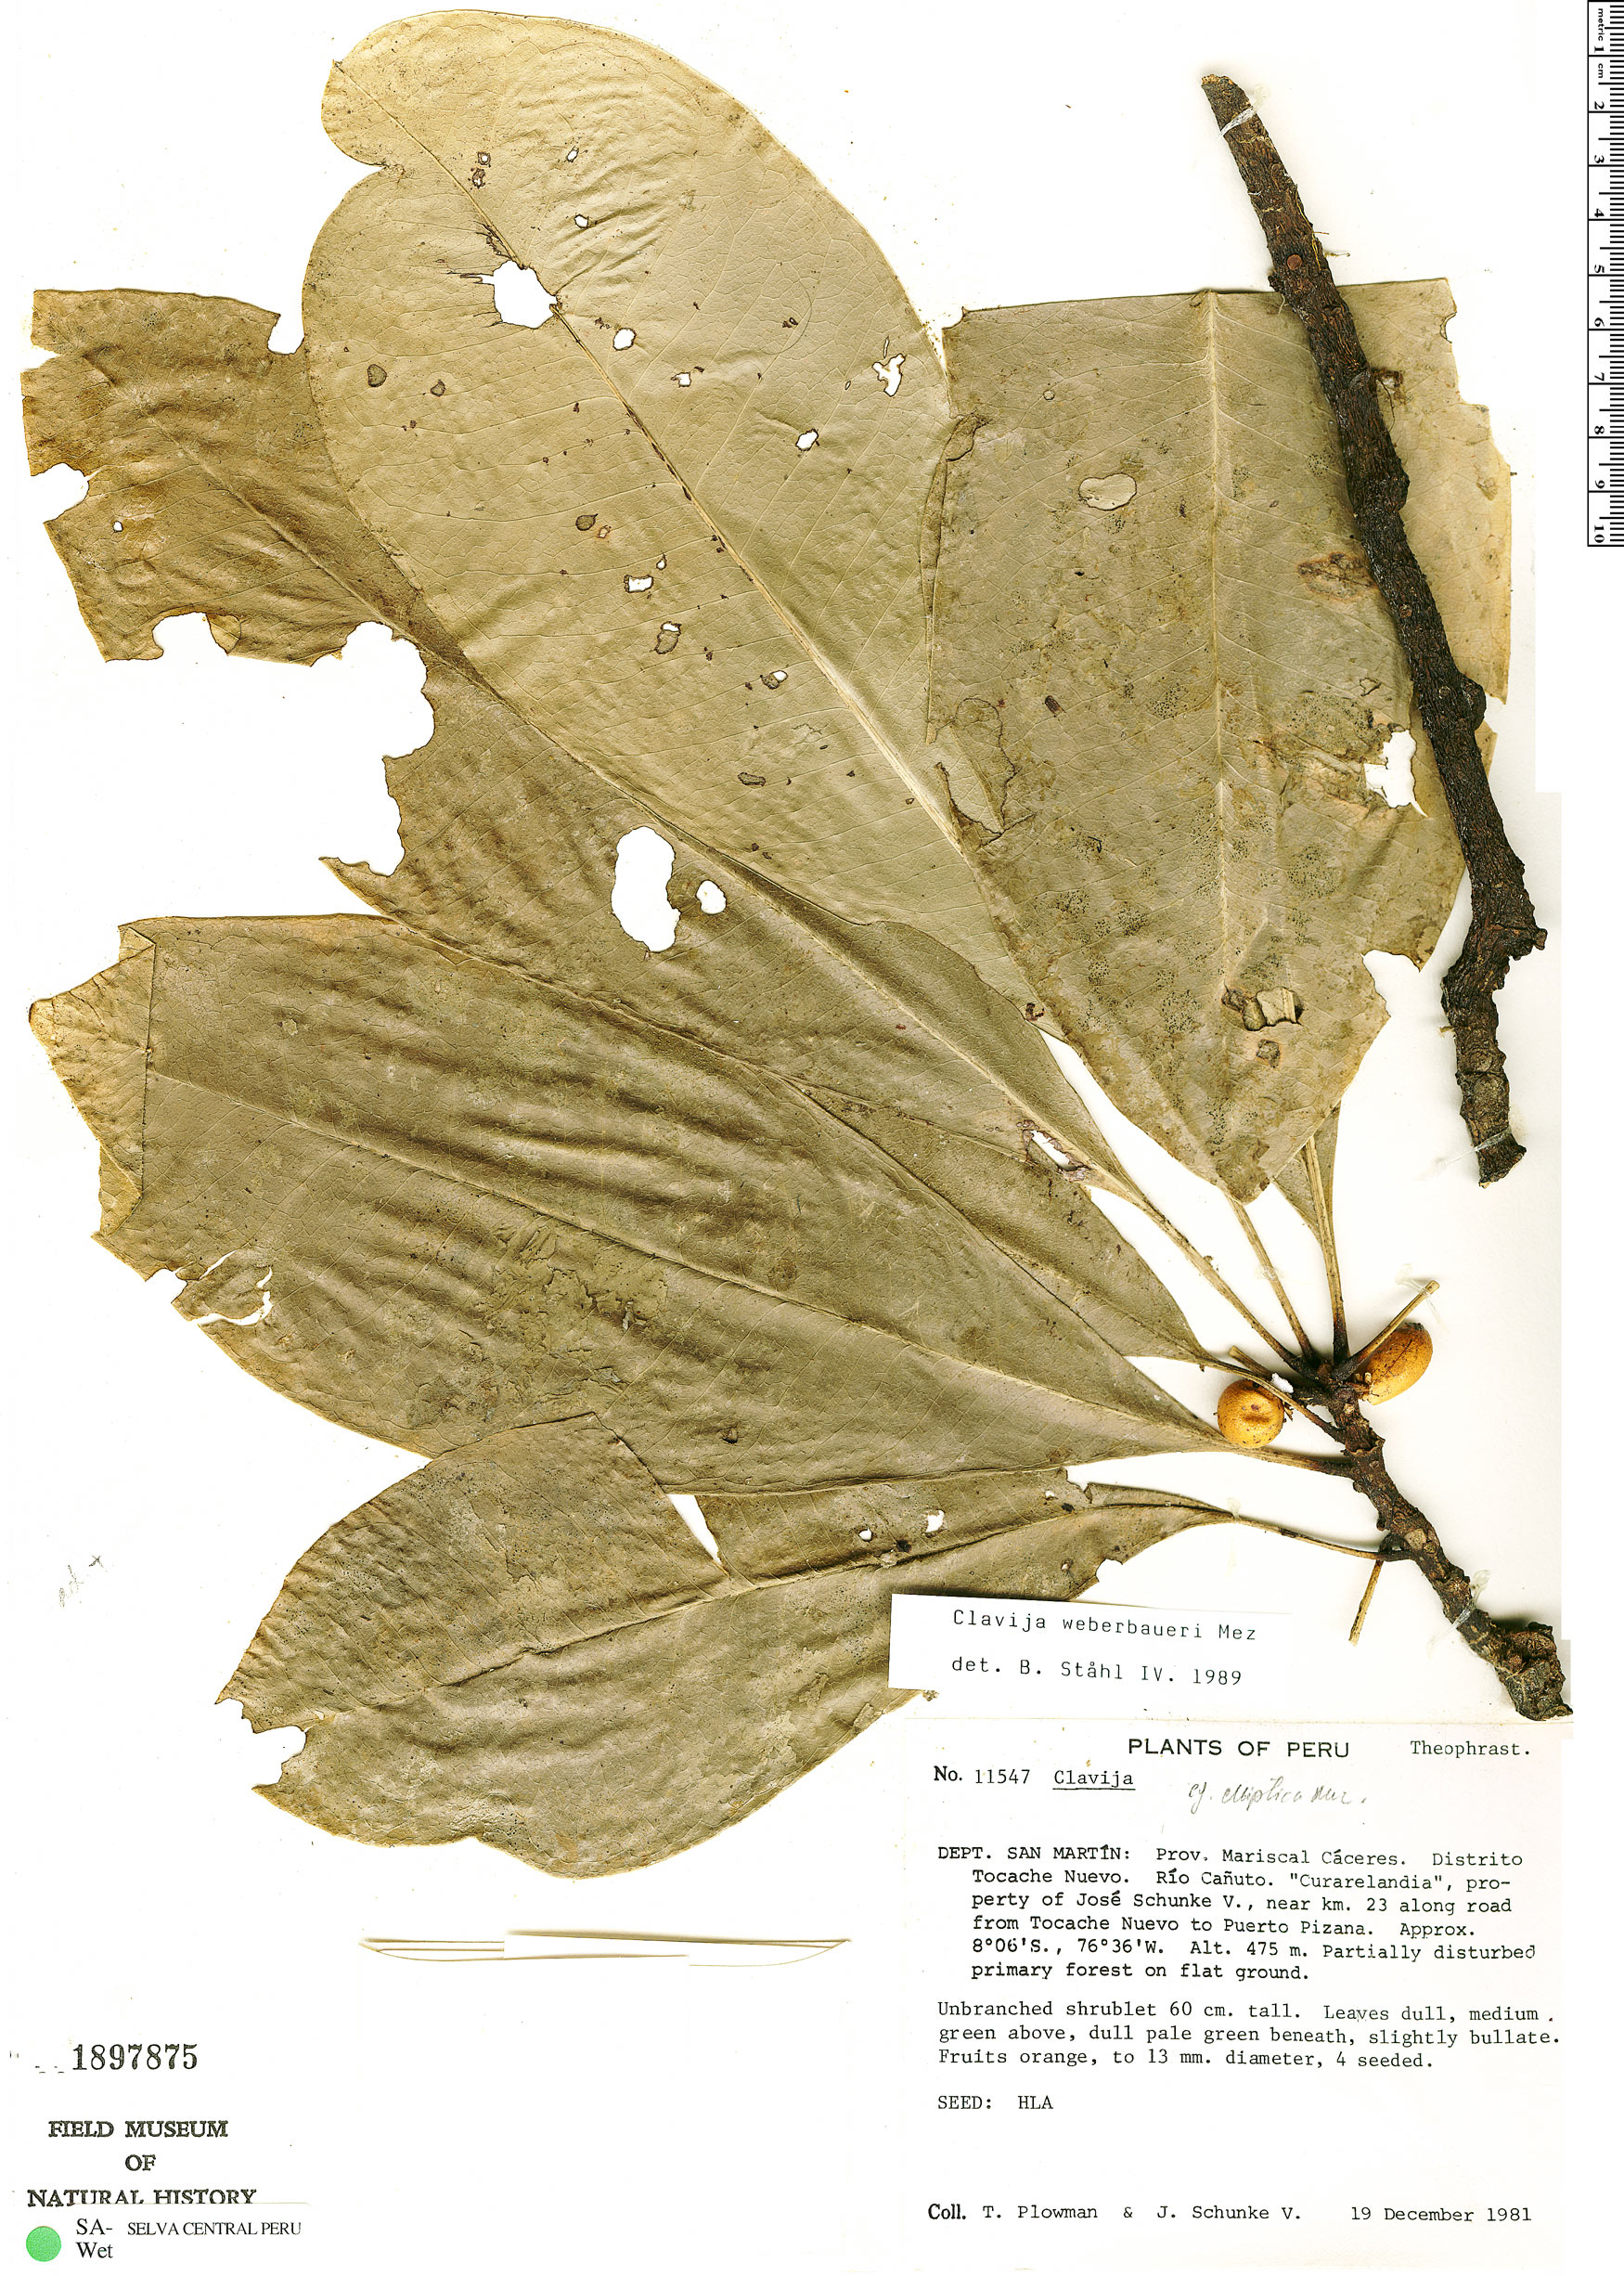 Espécimen: Clavija weberbaueri